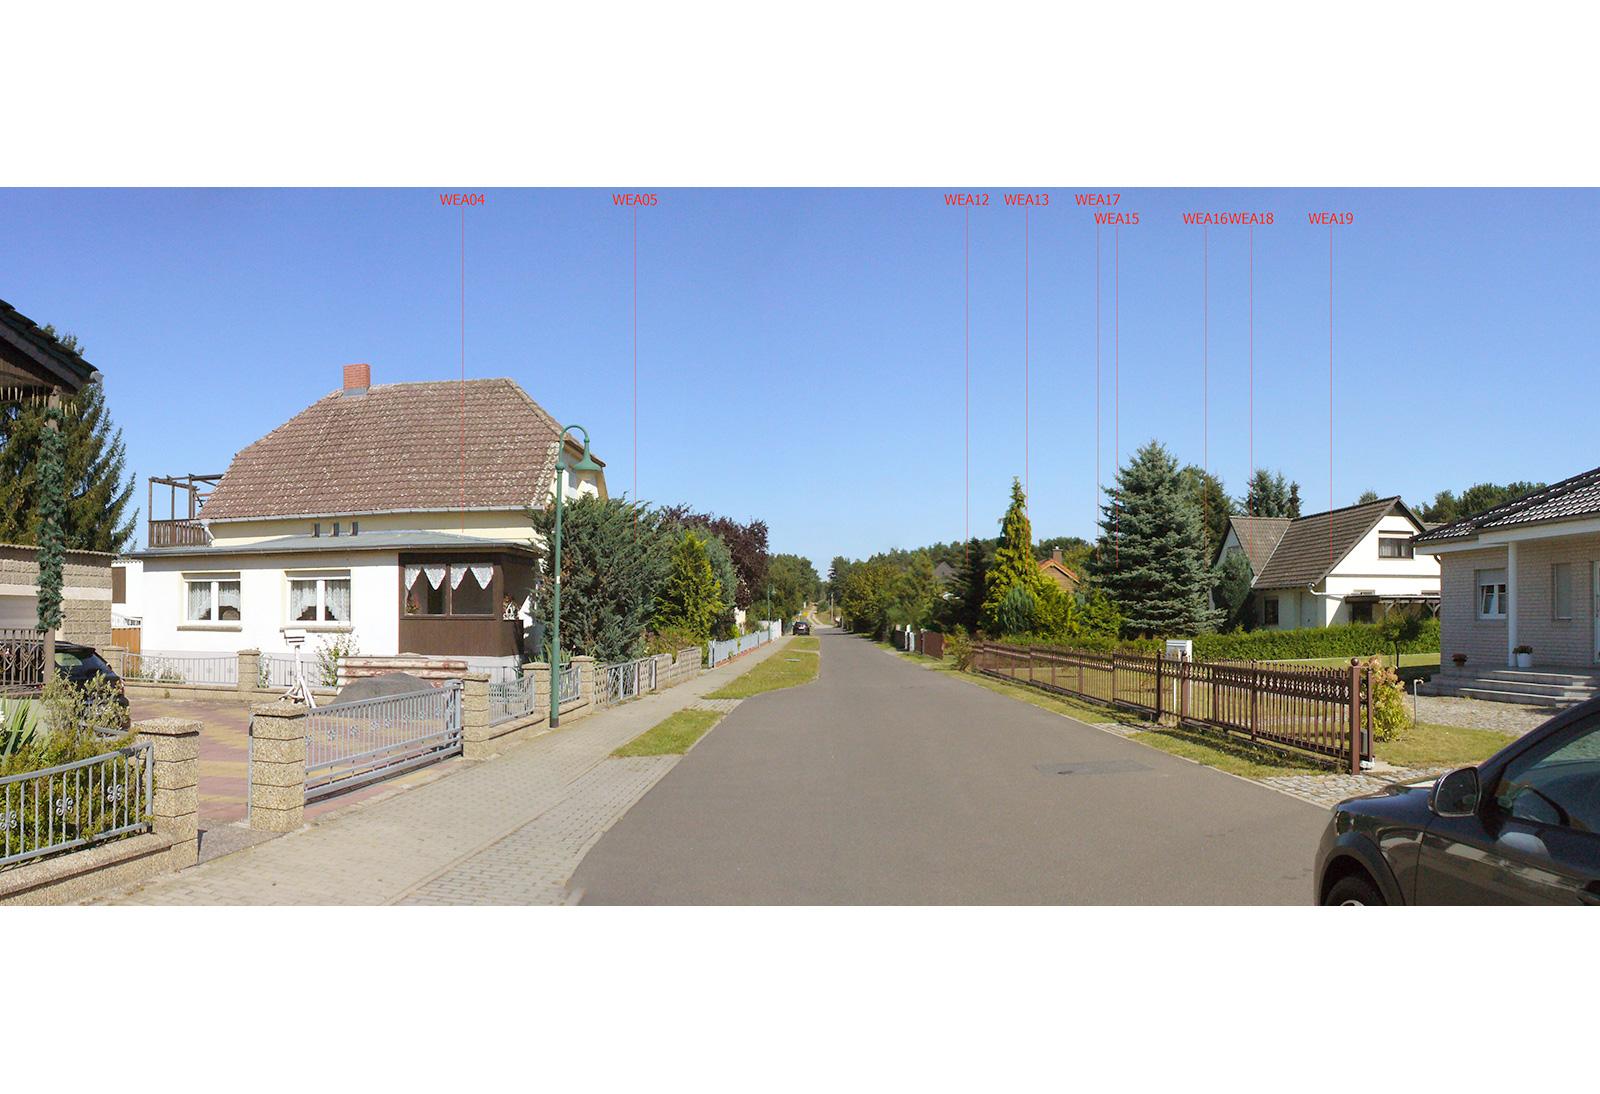 Kloster Lehnin Position 2 Visualisierung